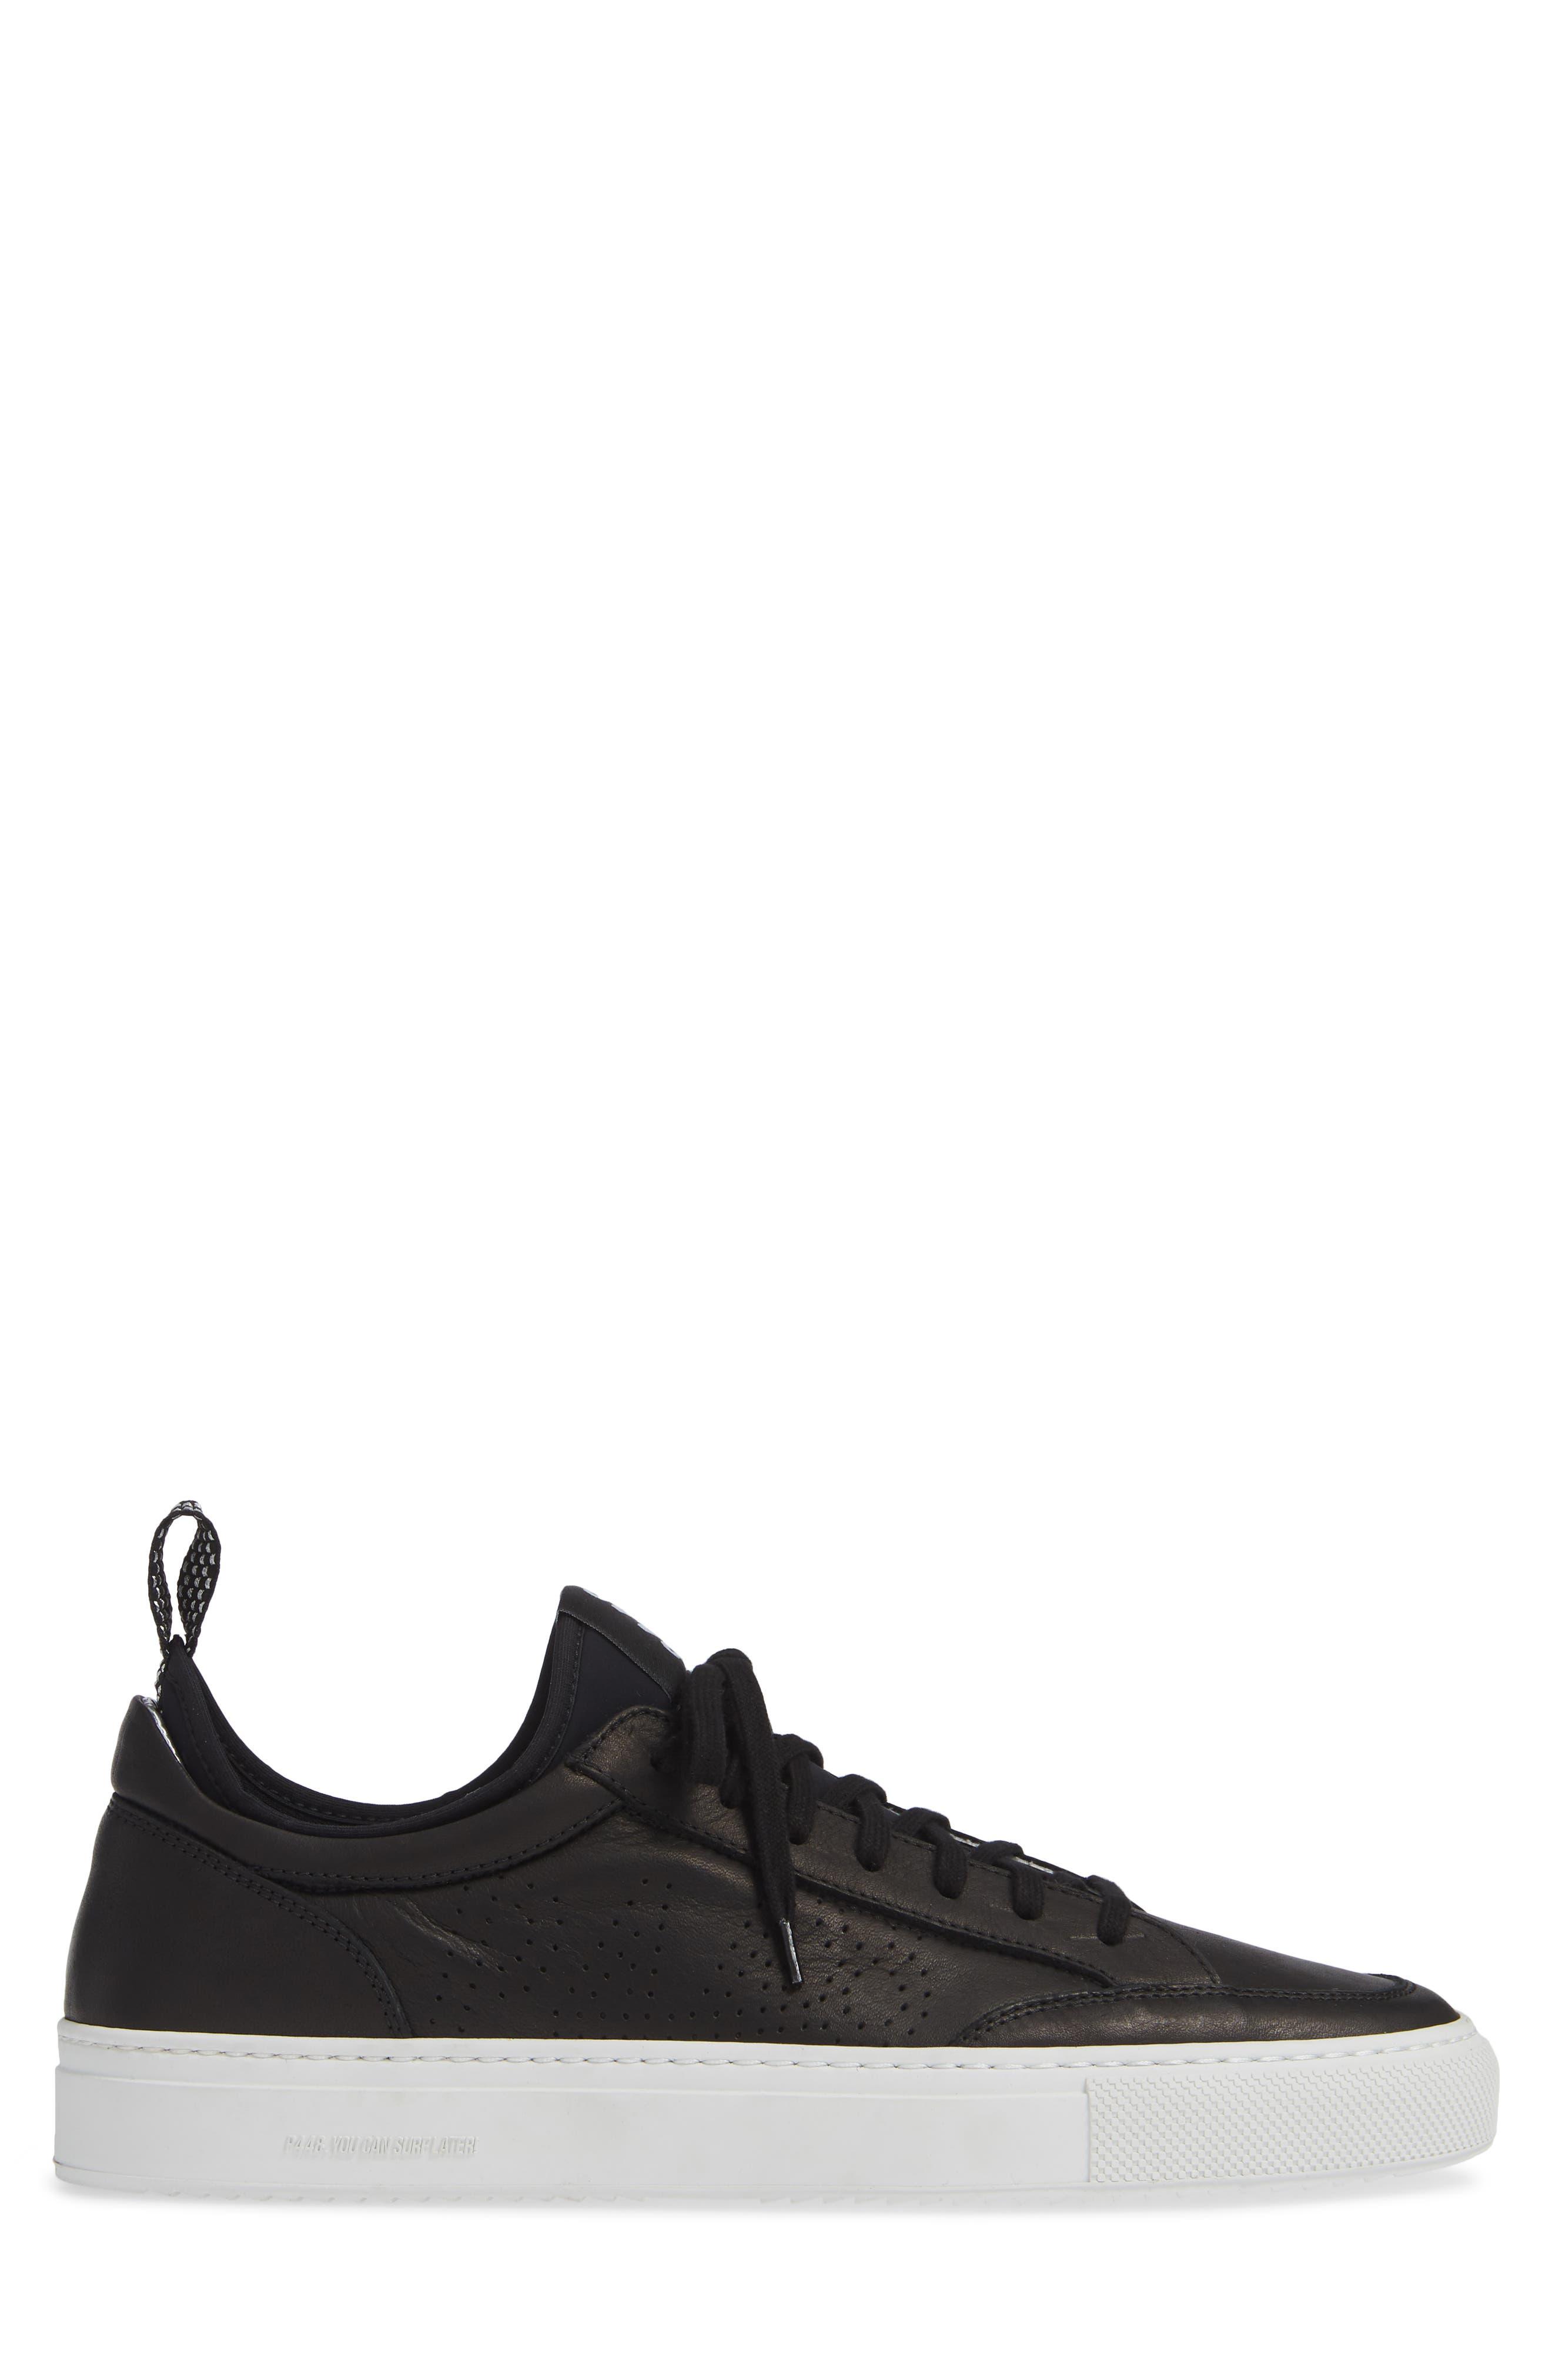 Absohosocks Sneaker,                             Alternate thumbnail 3, color,                             BLACK